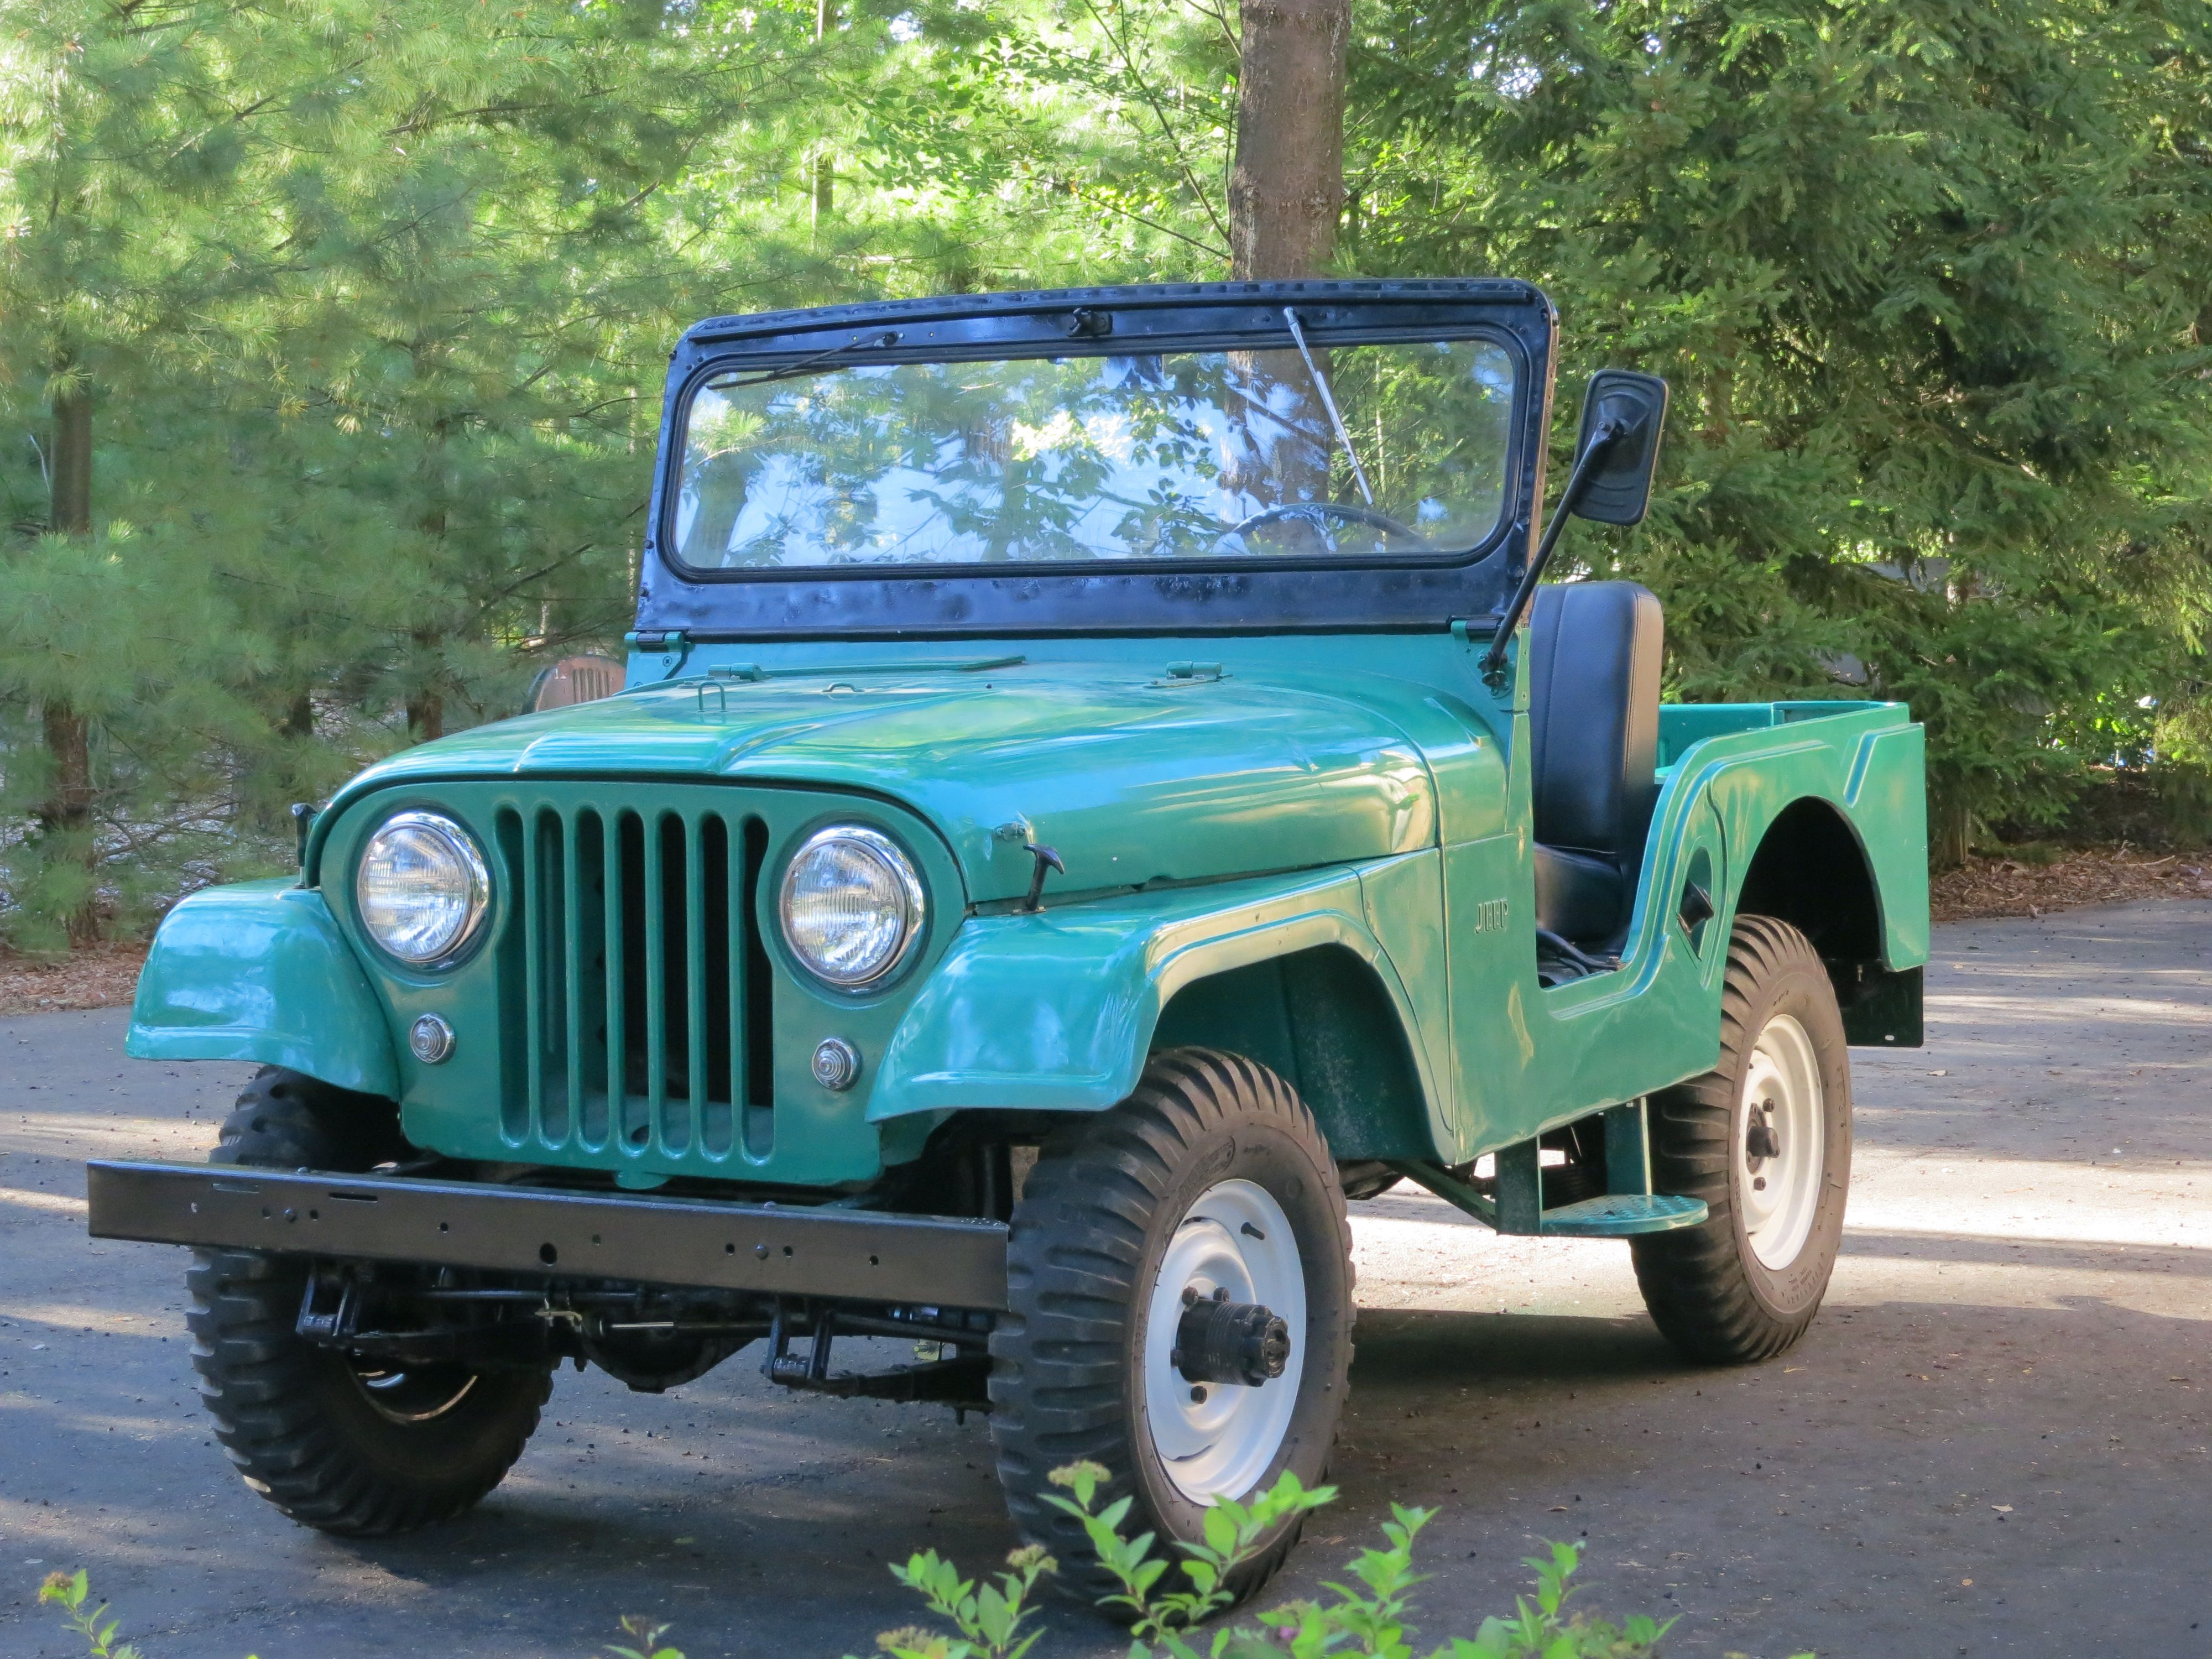 Jeep Willys For Sale In India >> 1959 Willys CJ5 Jeep | My Style | Pinterest | Cj5 jeep ...